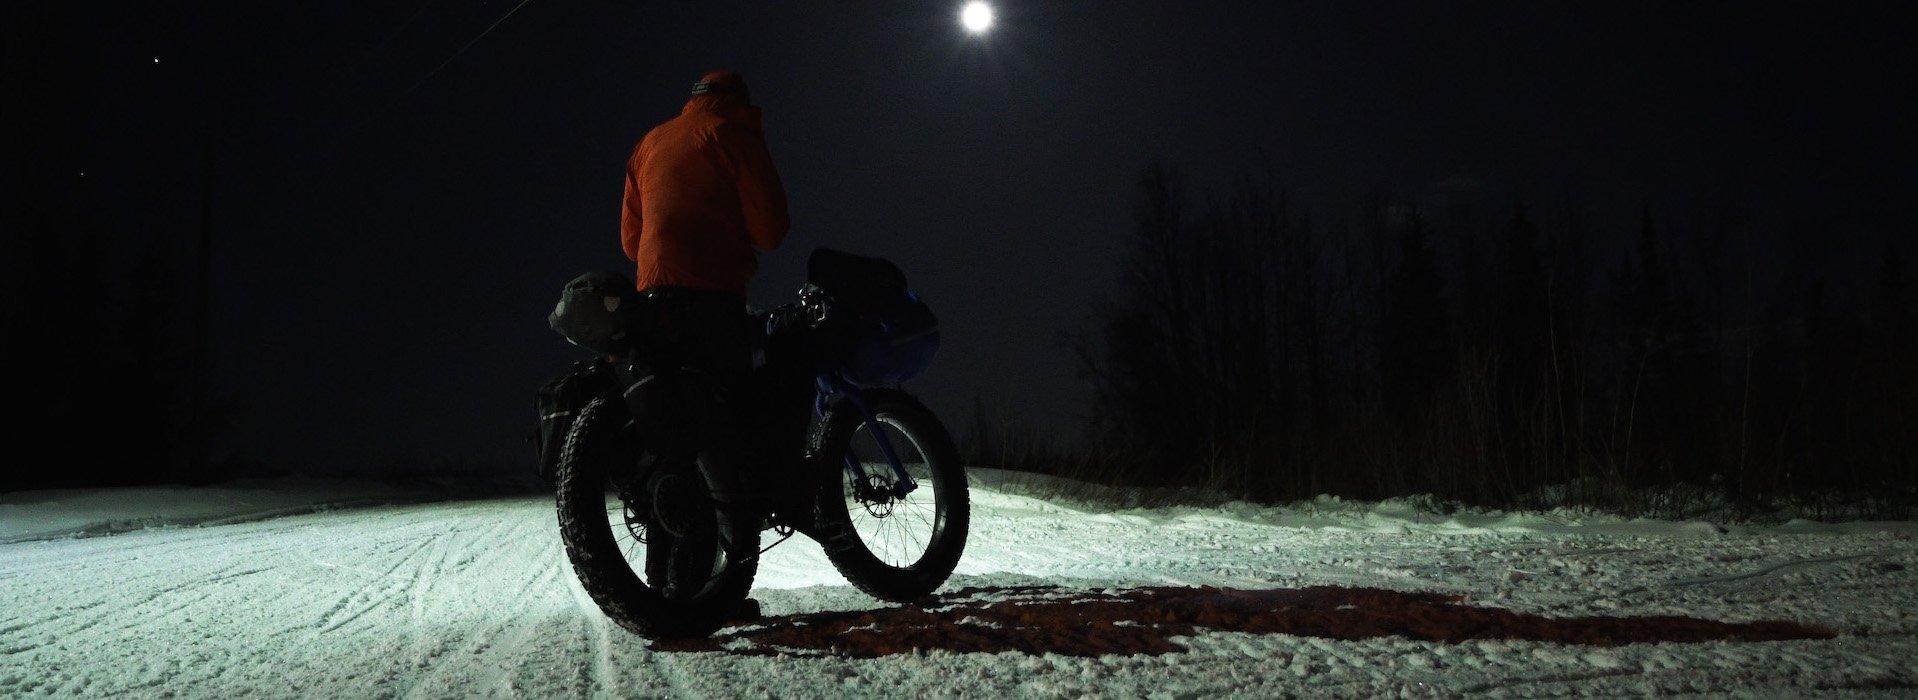 Safety to Nome VIMFF 2019 BG